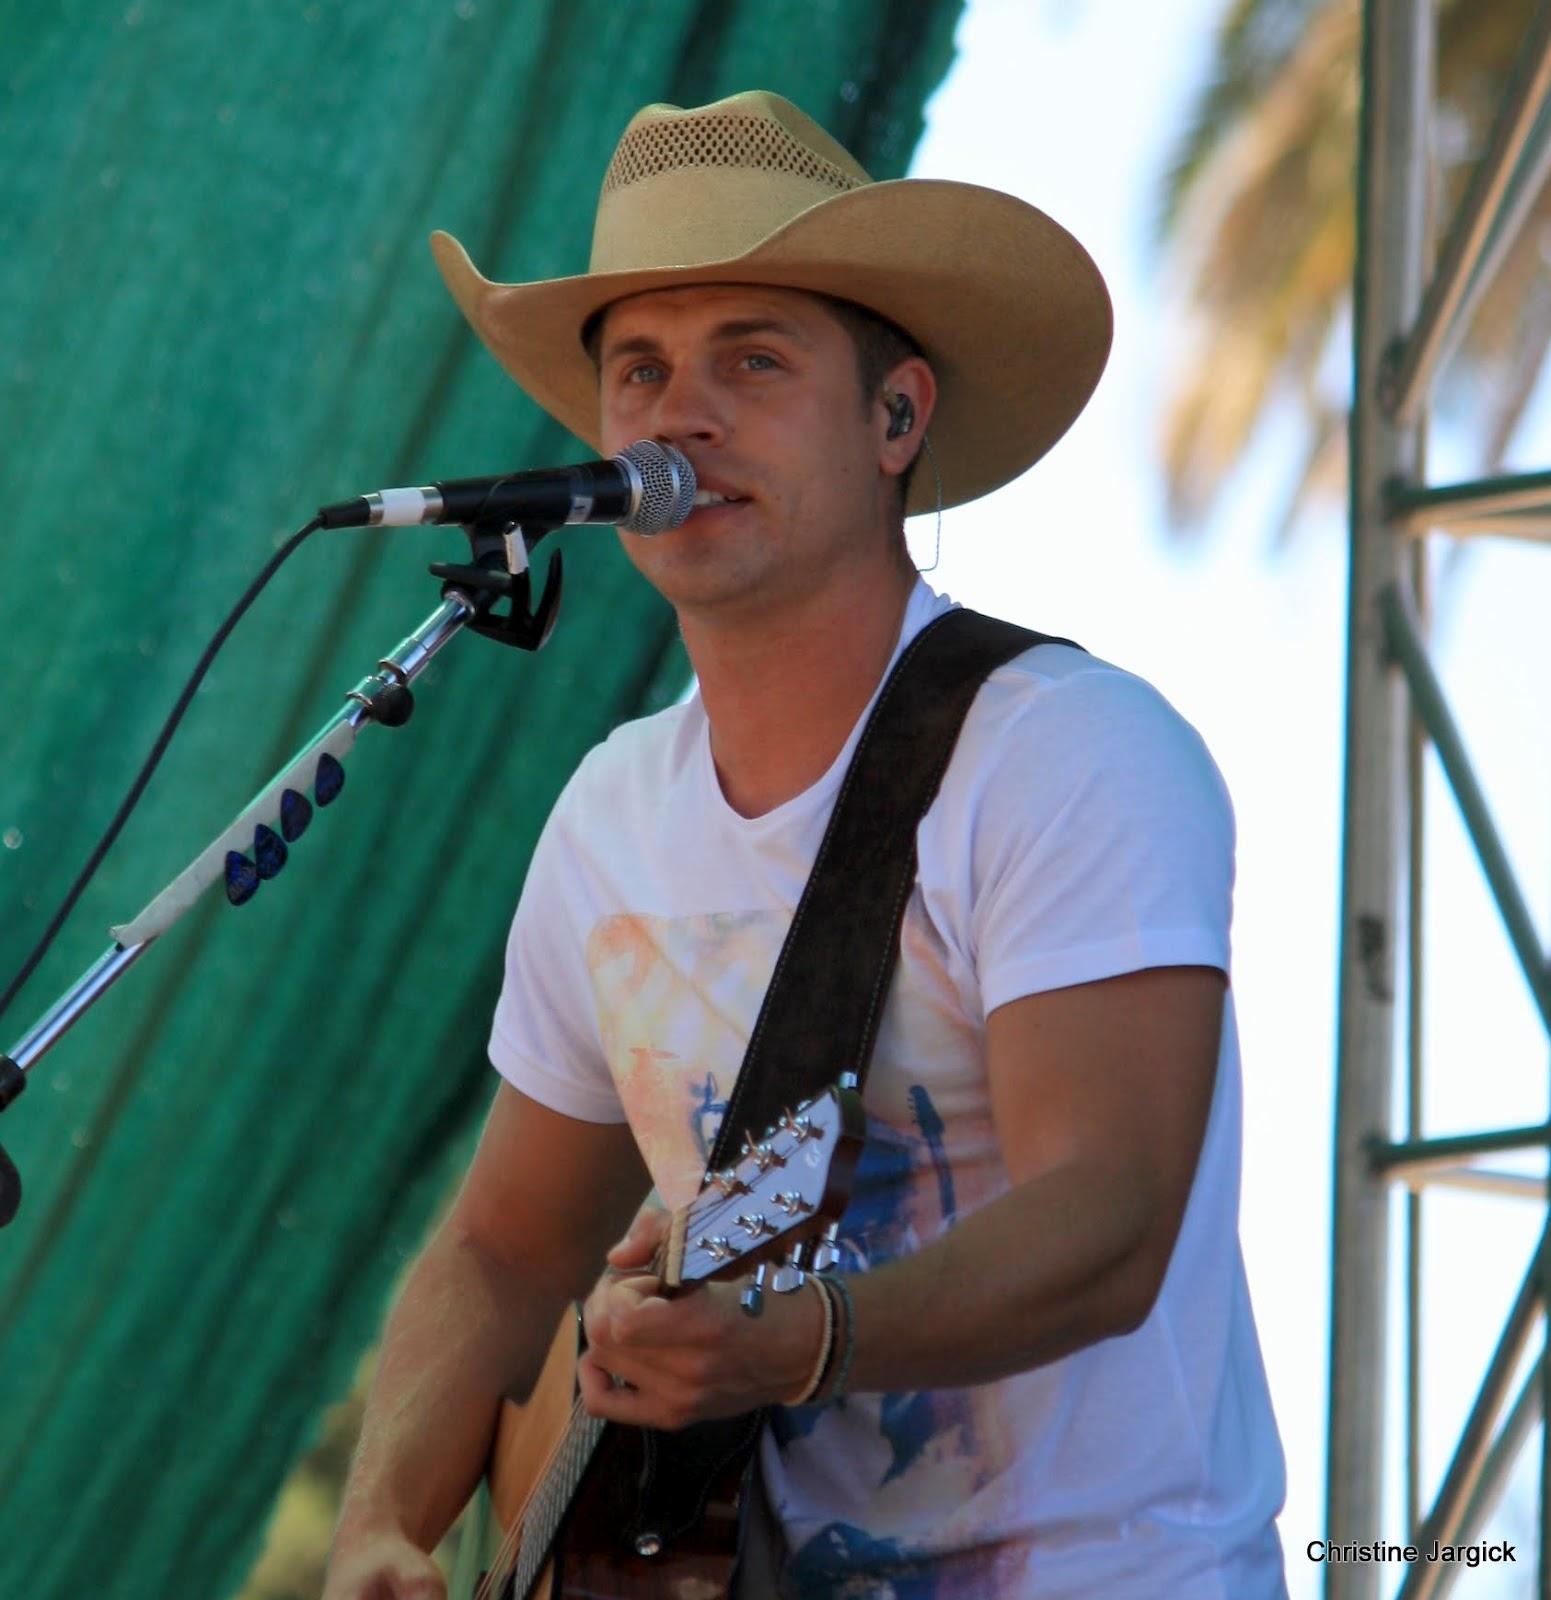 Dustin Lynch: Country Stalkers: Dustin Lynch At The Gilroy Garlic